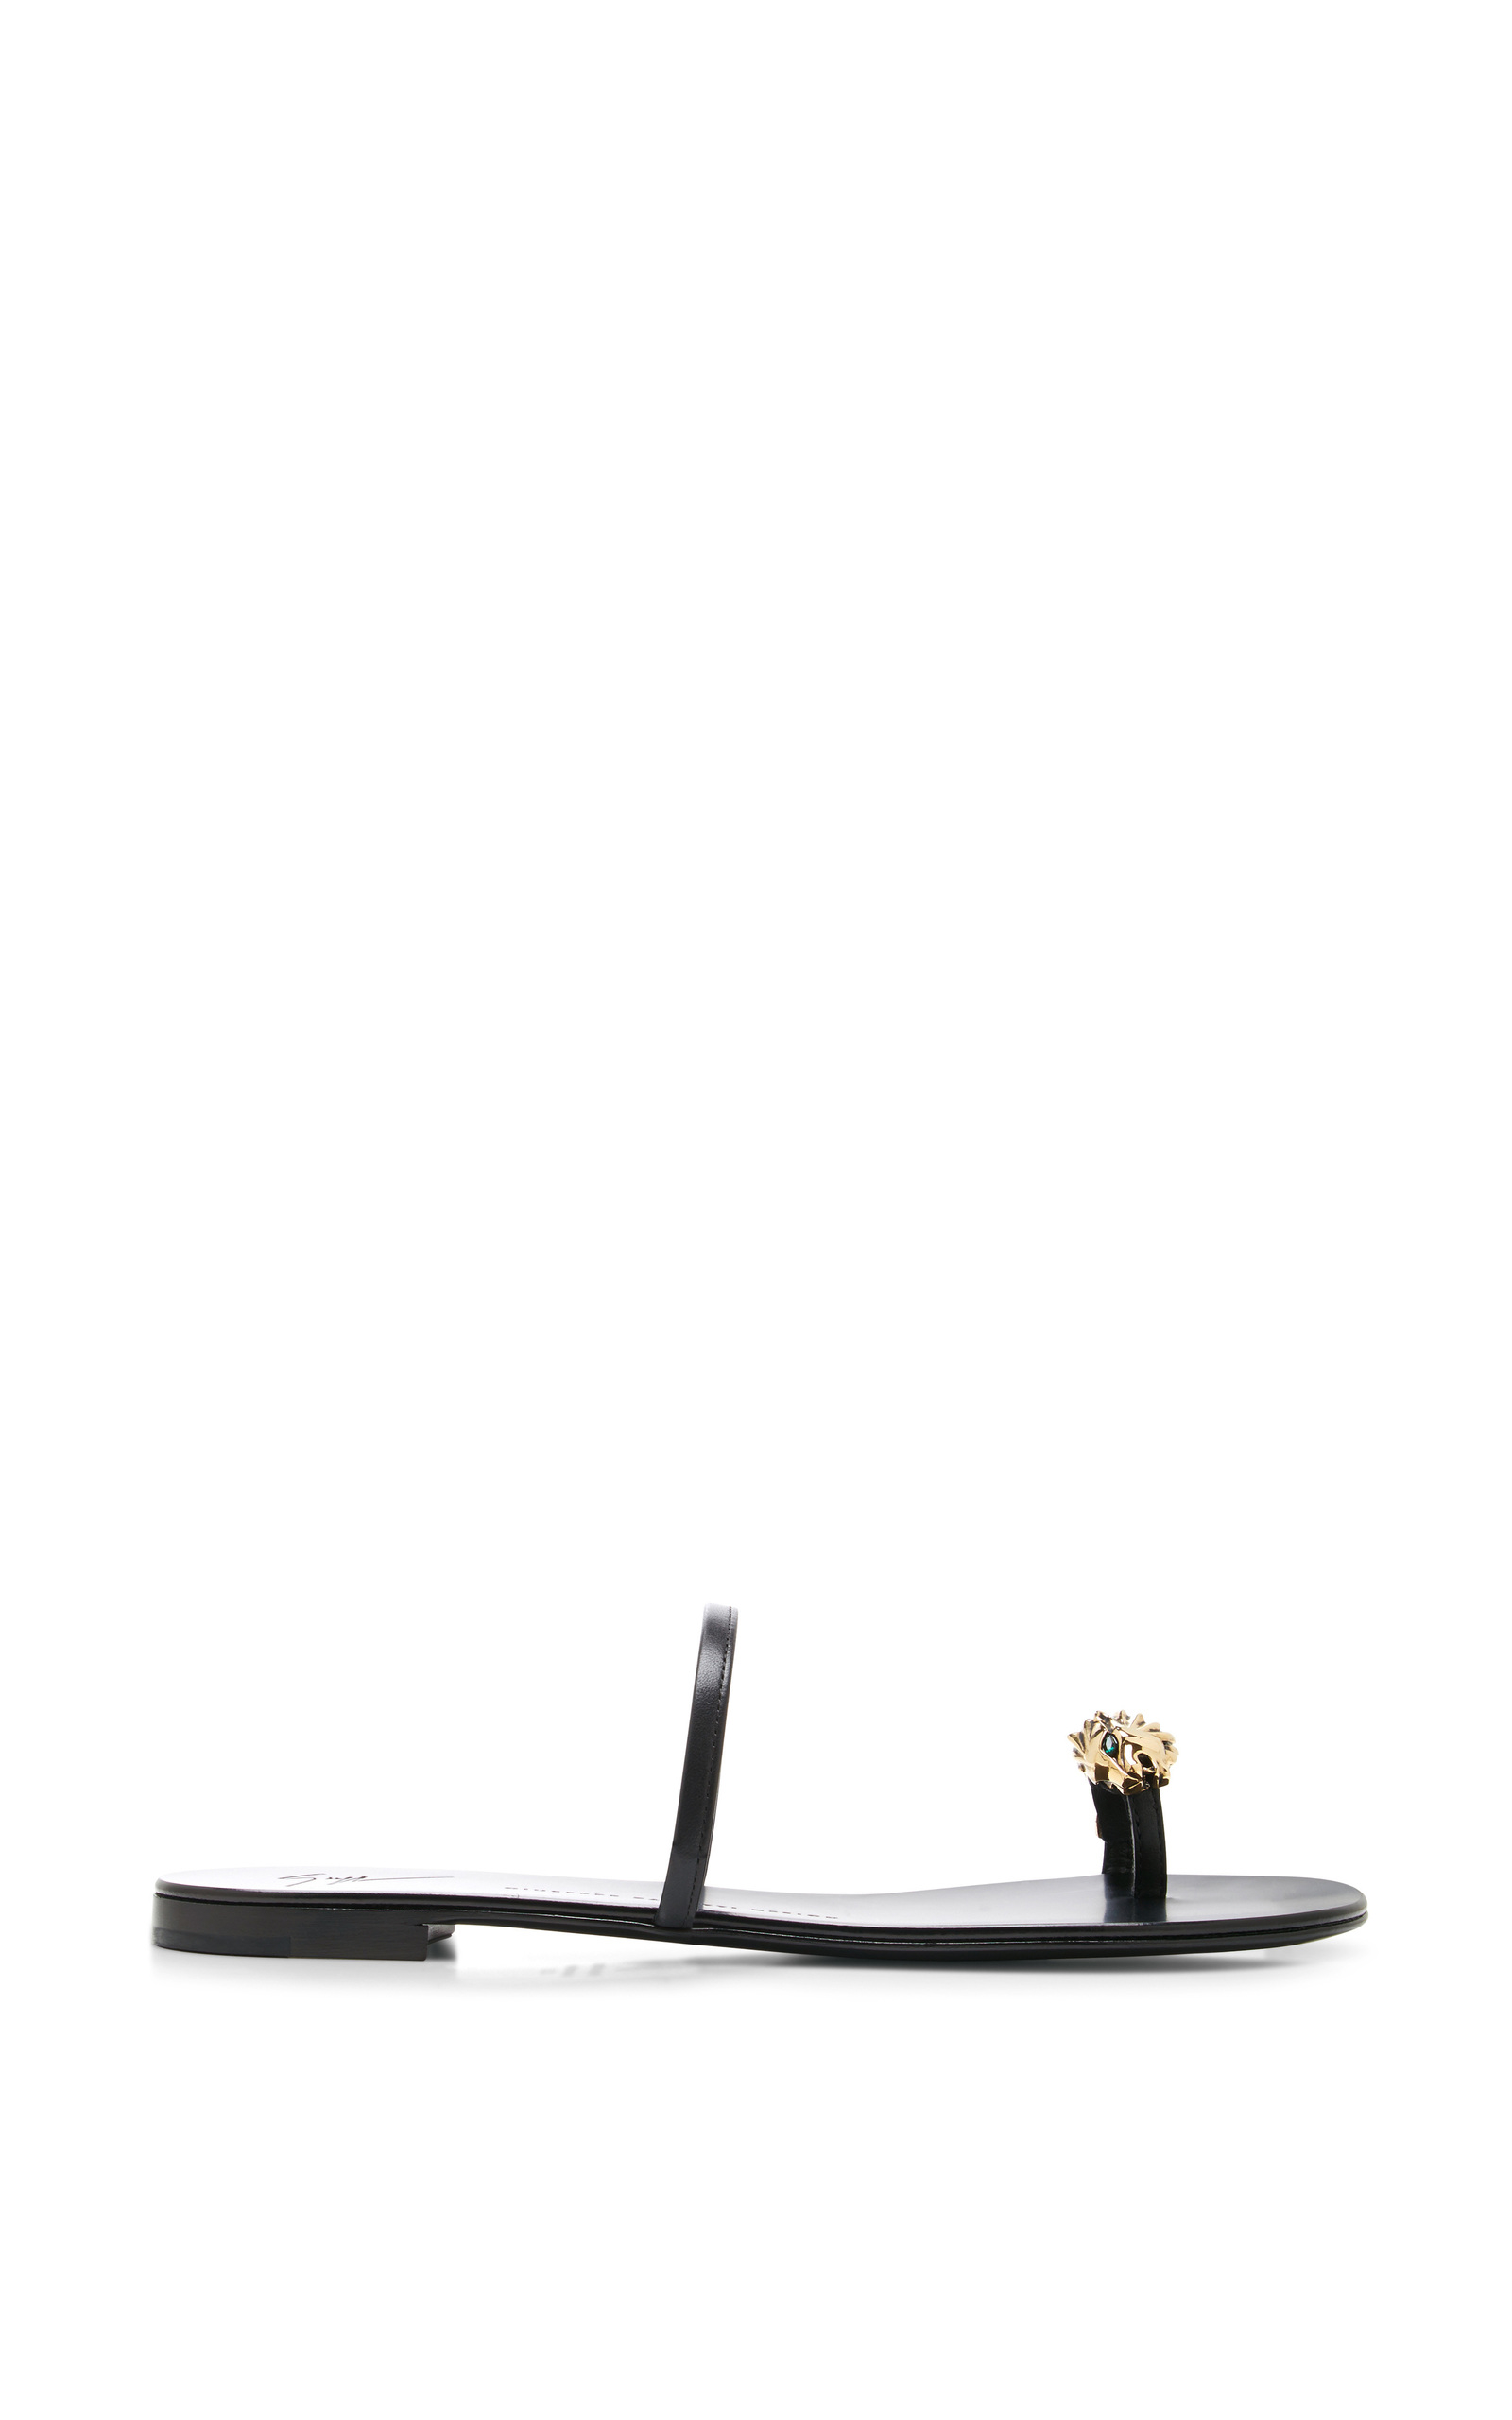 a66484ad4f3f6 Giuseppe Zanotti Rock Lion-Head Leather Sandals in Black - Lyst